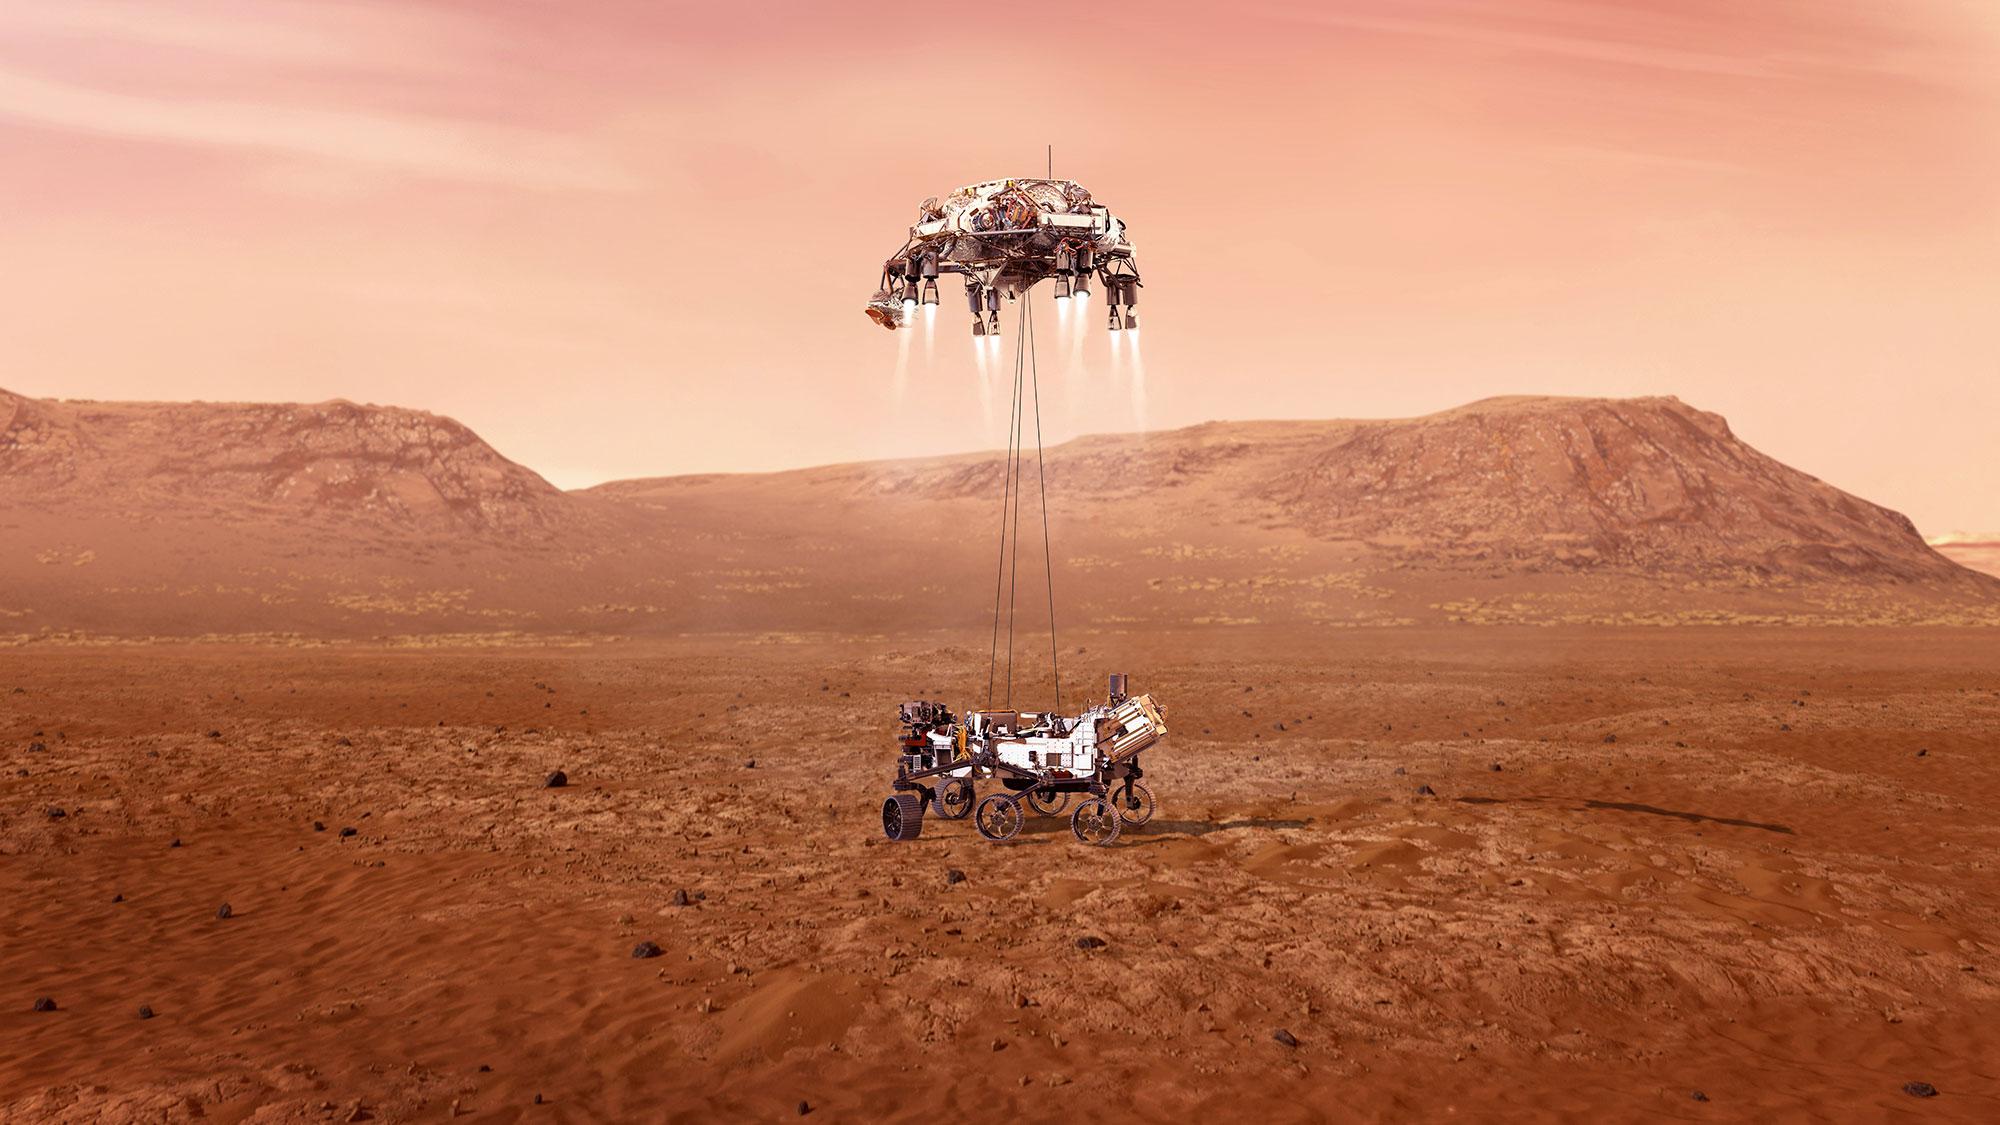 Credit: NASA / JPL - Caltech